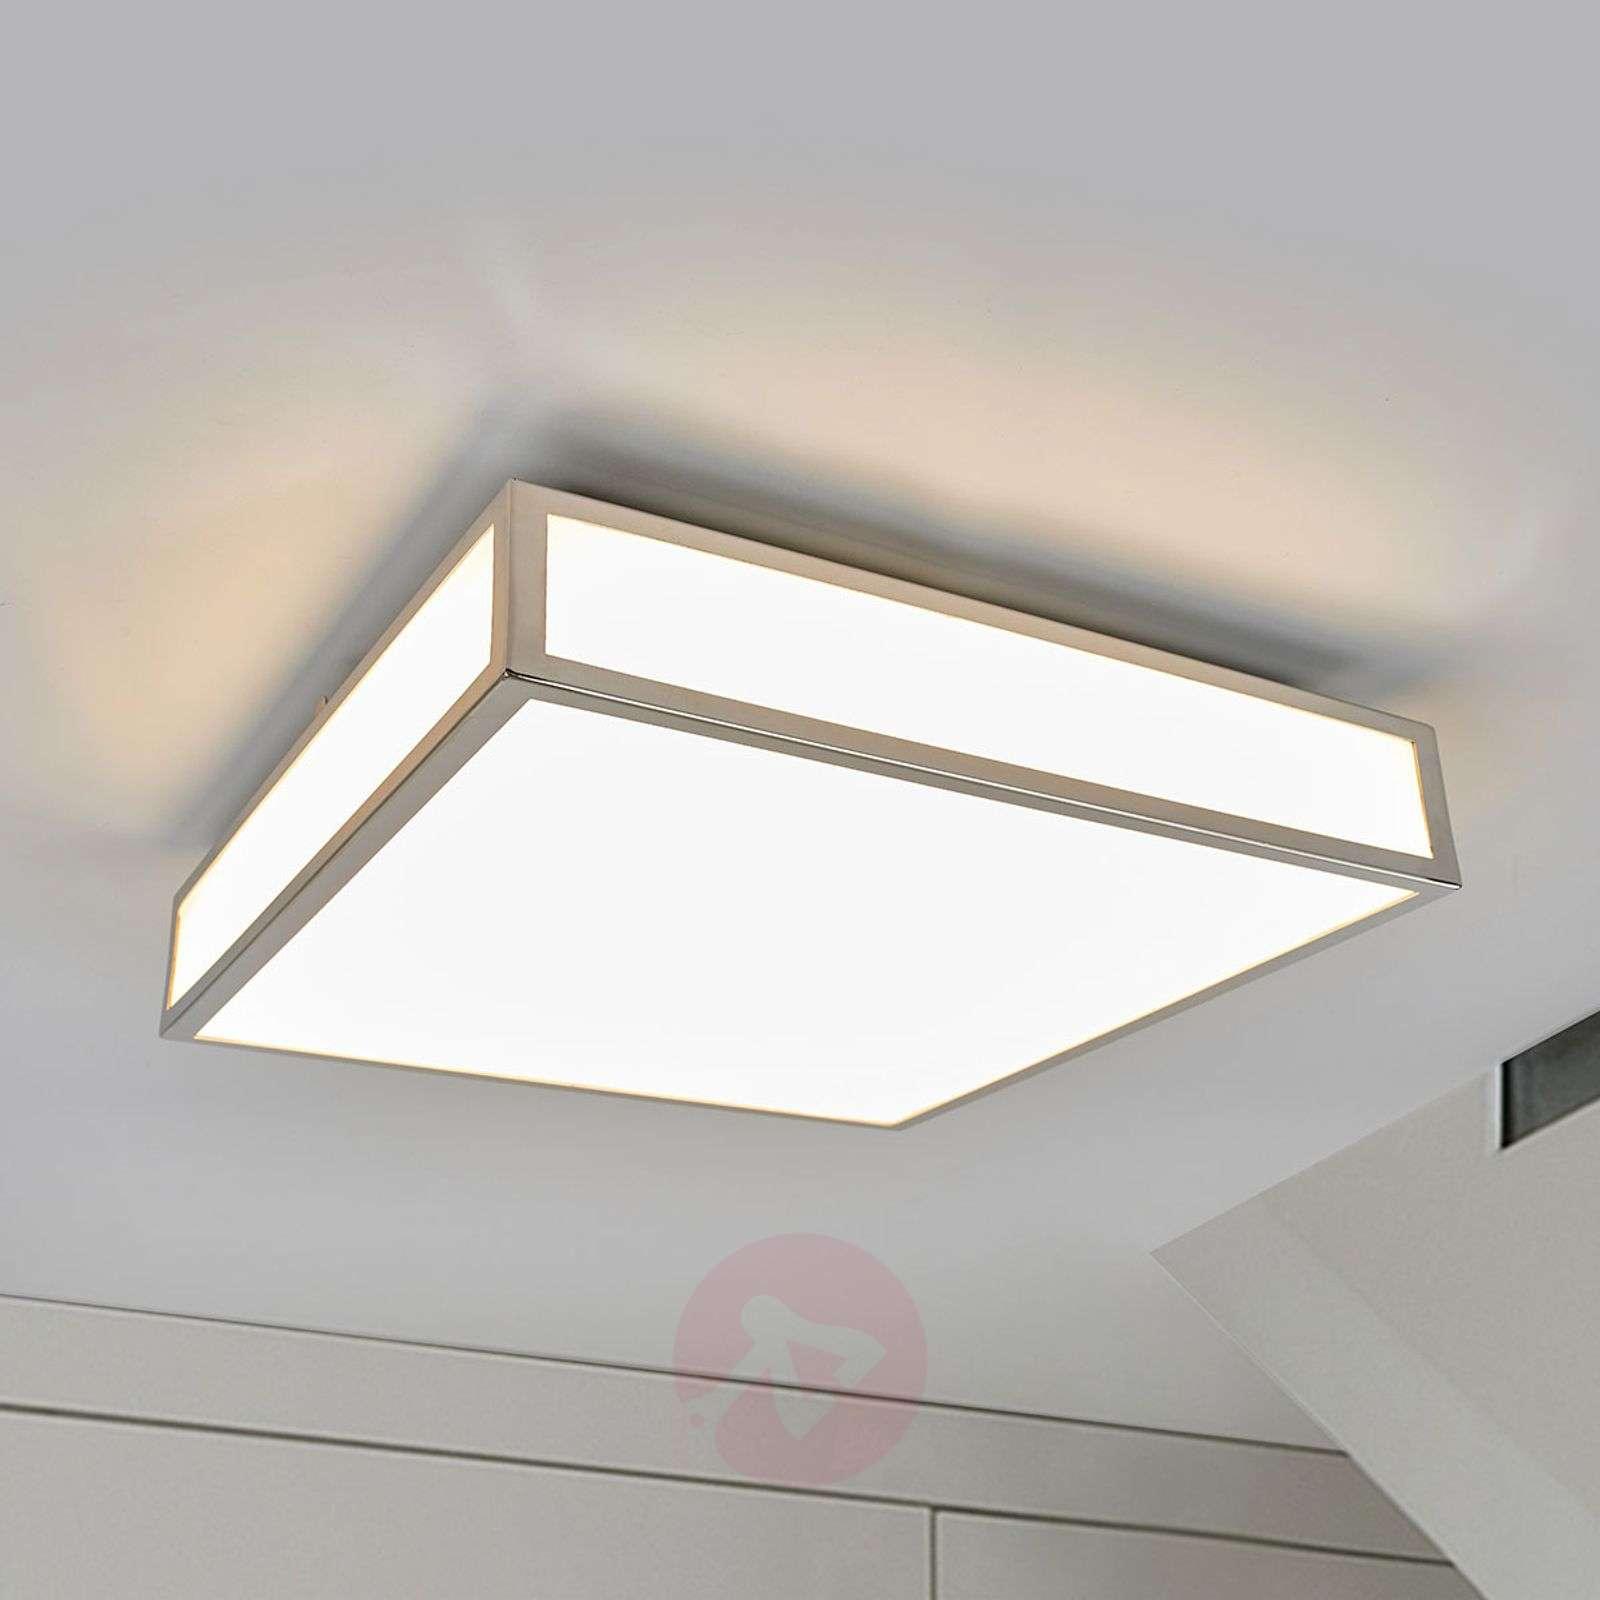 Damiano kulmikas LED-kattolamppu-9625168-02